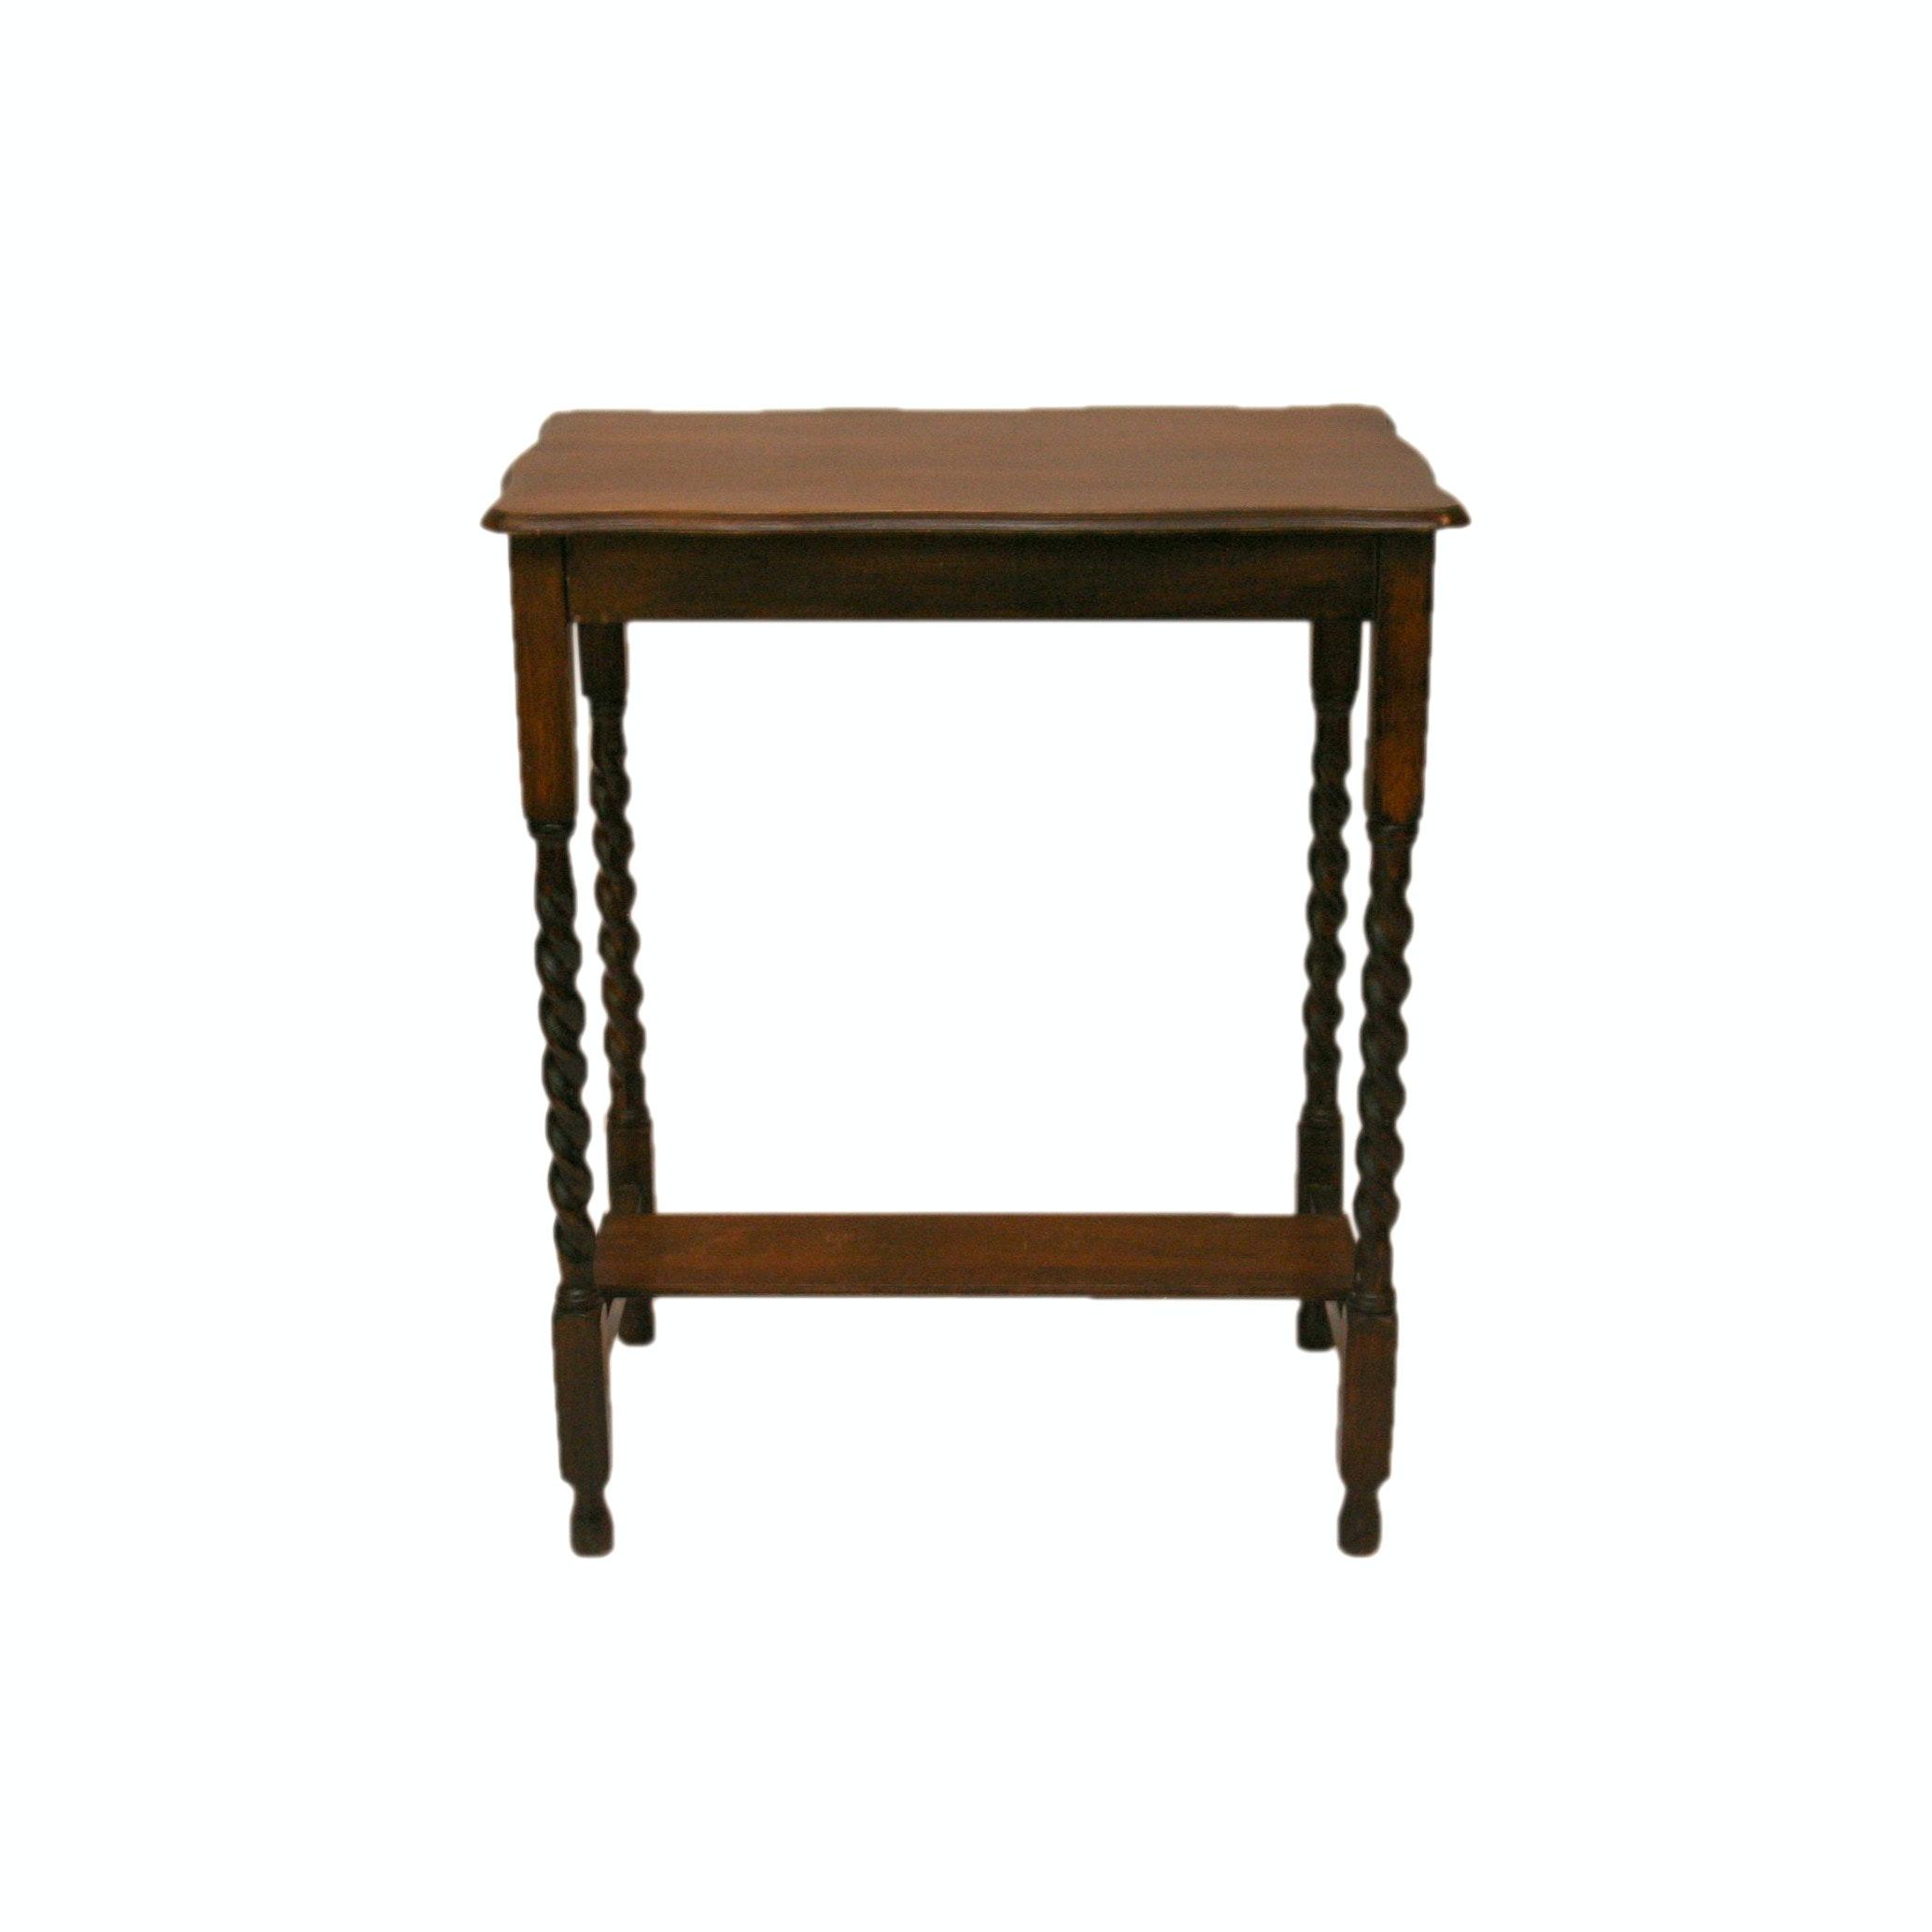 Vintage Jacobean Revival Style Walnut Barley Twist Stand